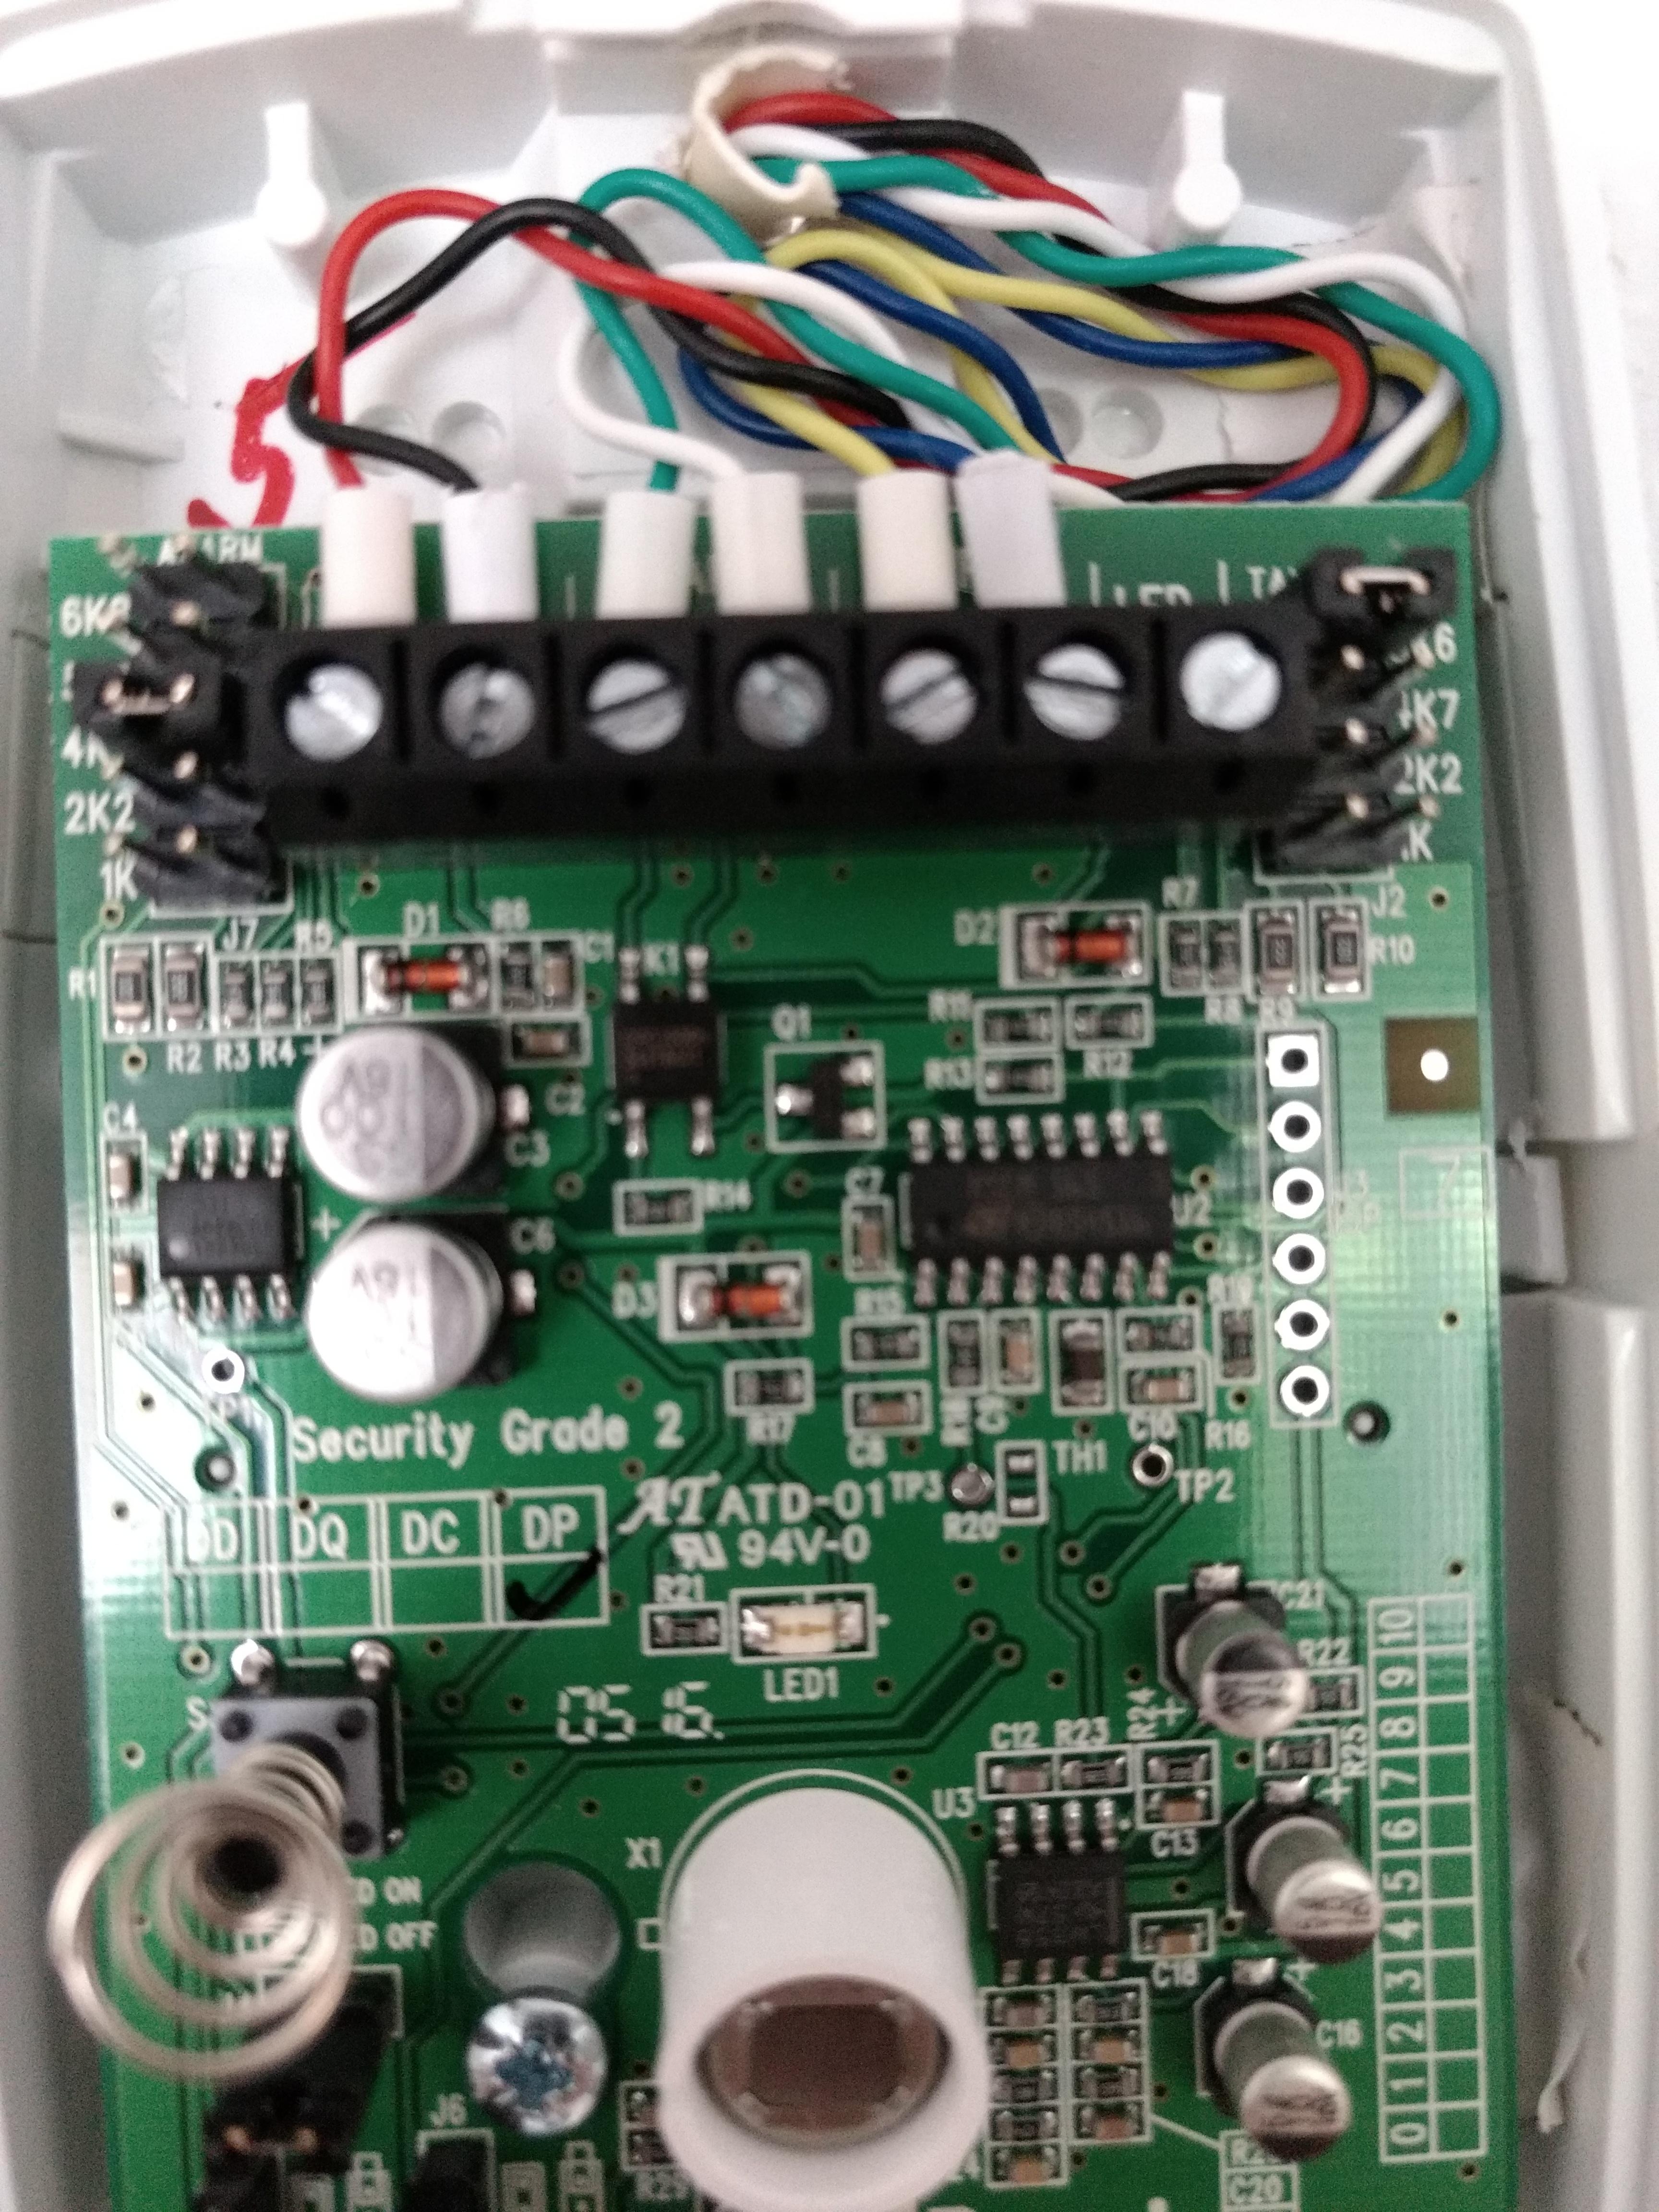 PIR Motion Detector Wiring